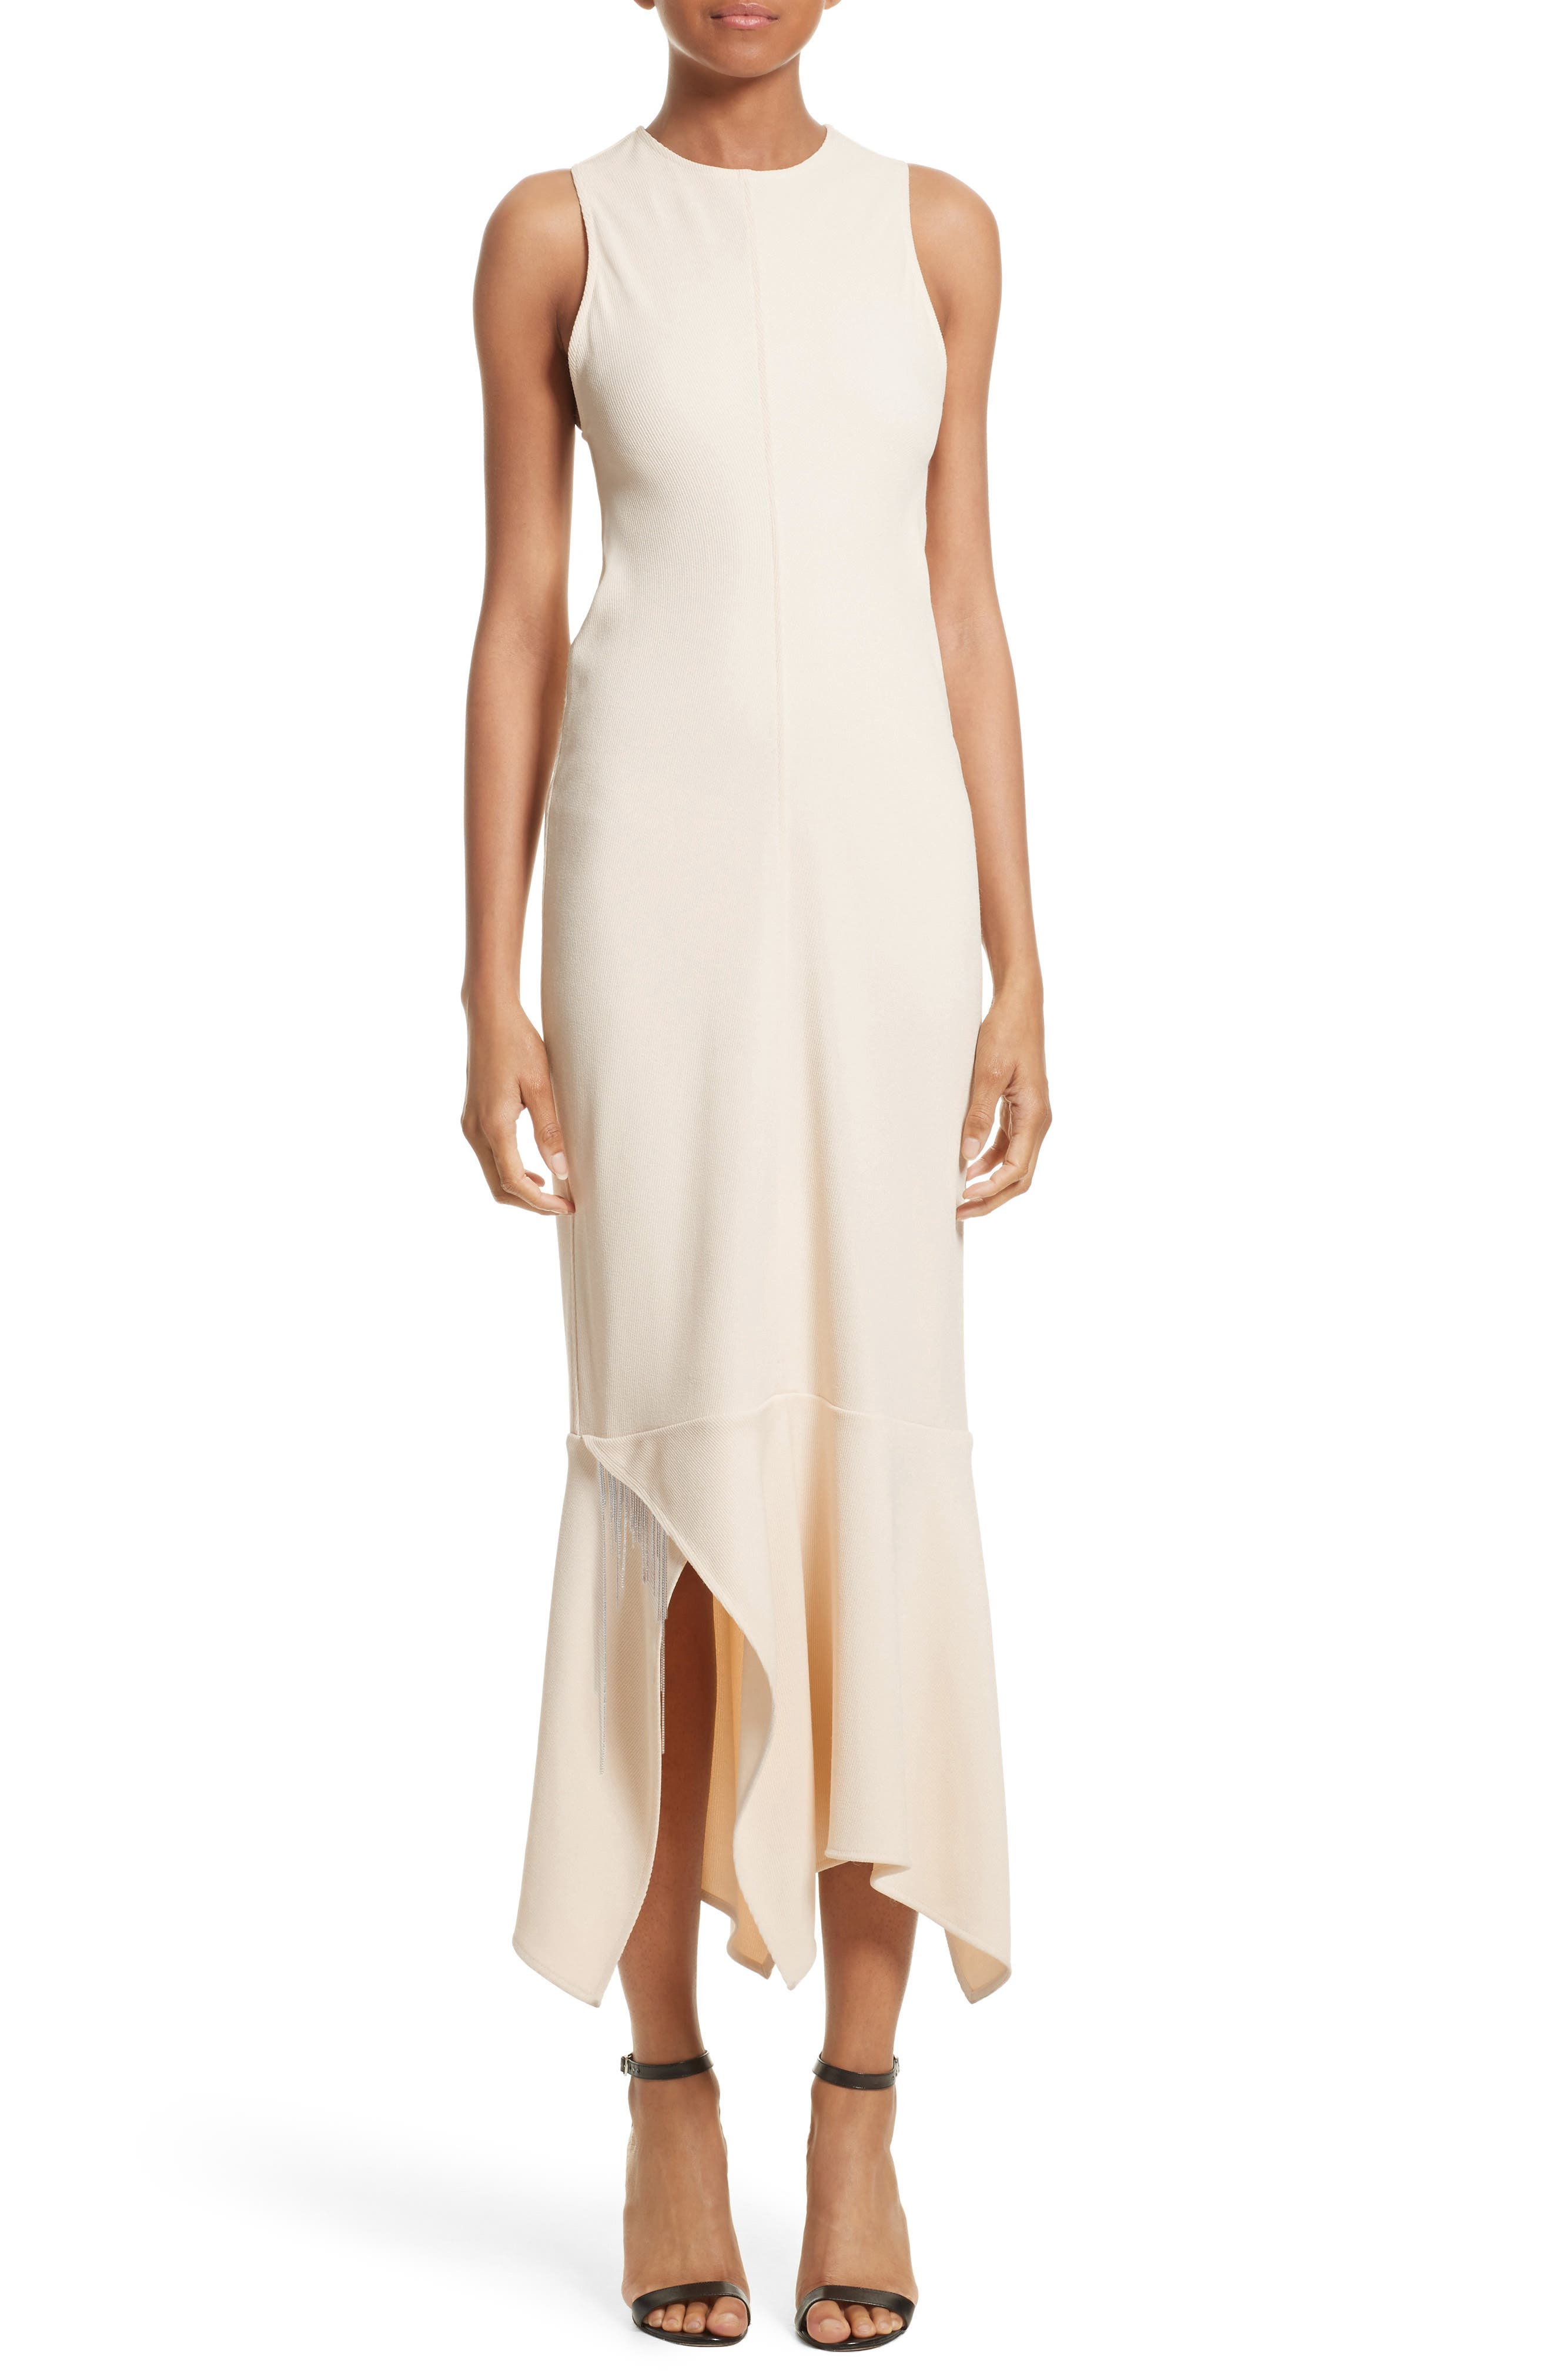 Main Image - Victoria Beckham Handkerchief Hem Racerback Dress